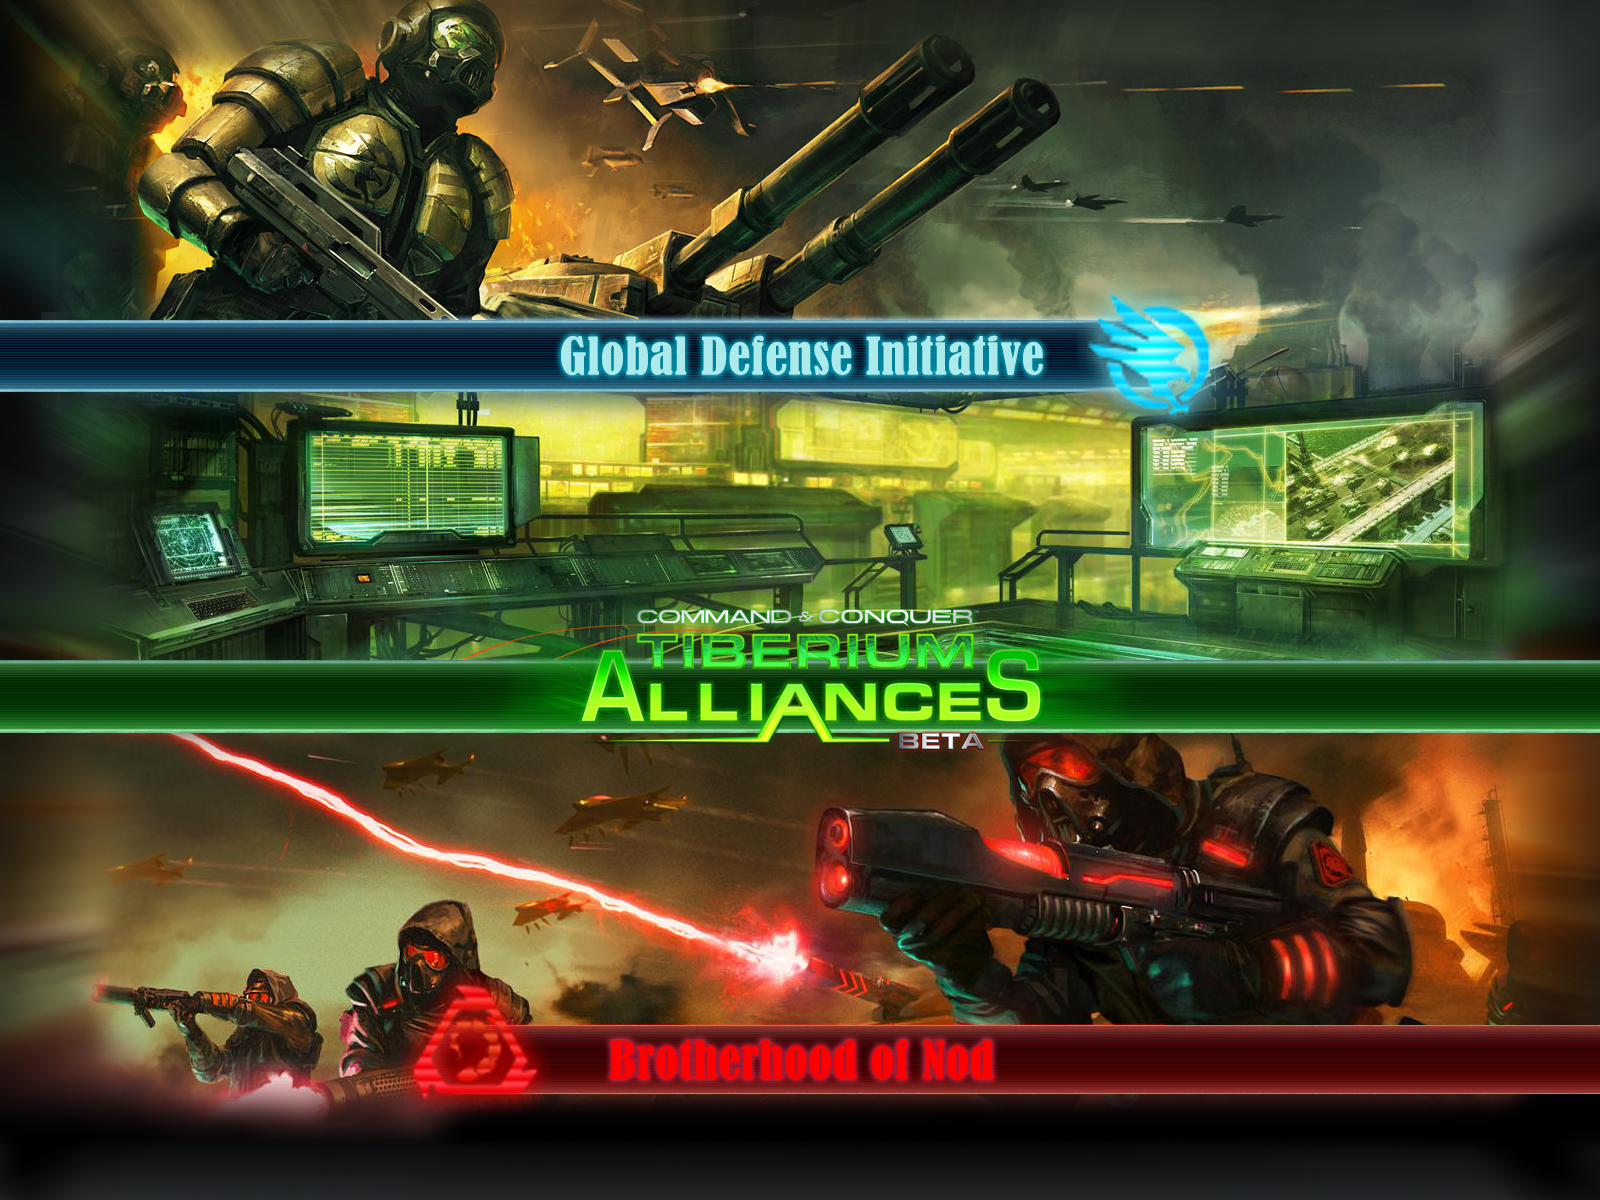 Tiberium_alliances_wp_contest_by_arcani_